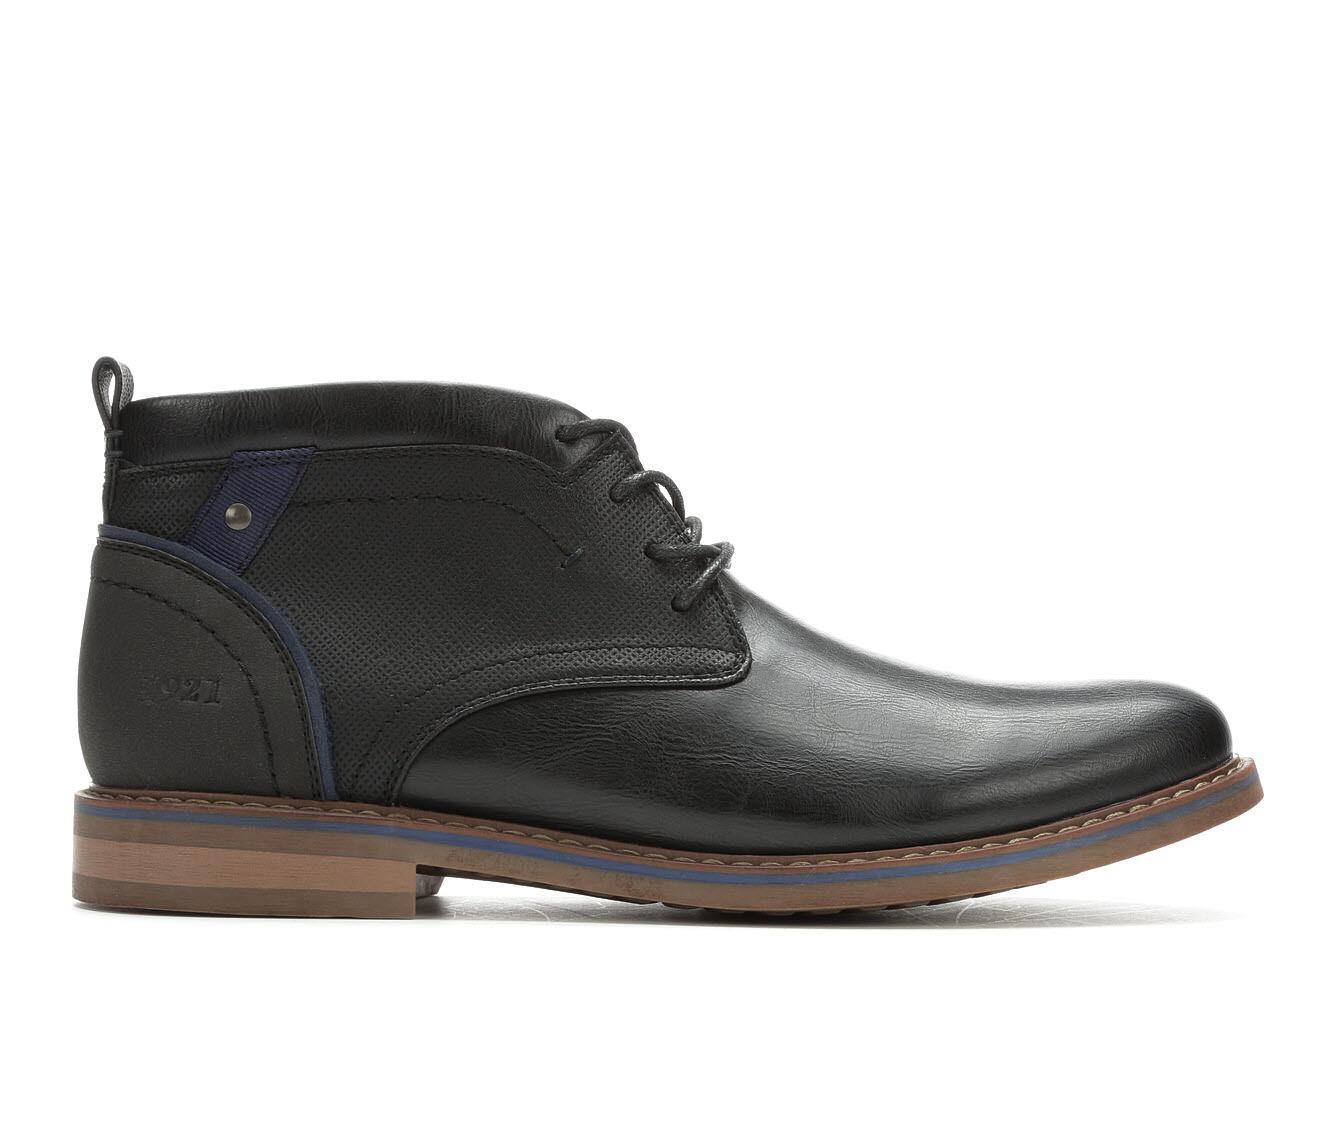 Bulk Discount Men's Freeman Brent Chukka Boots Black